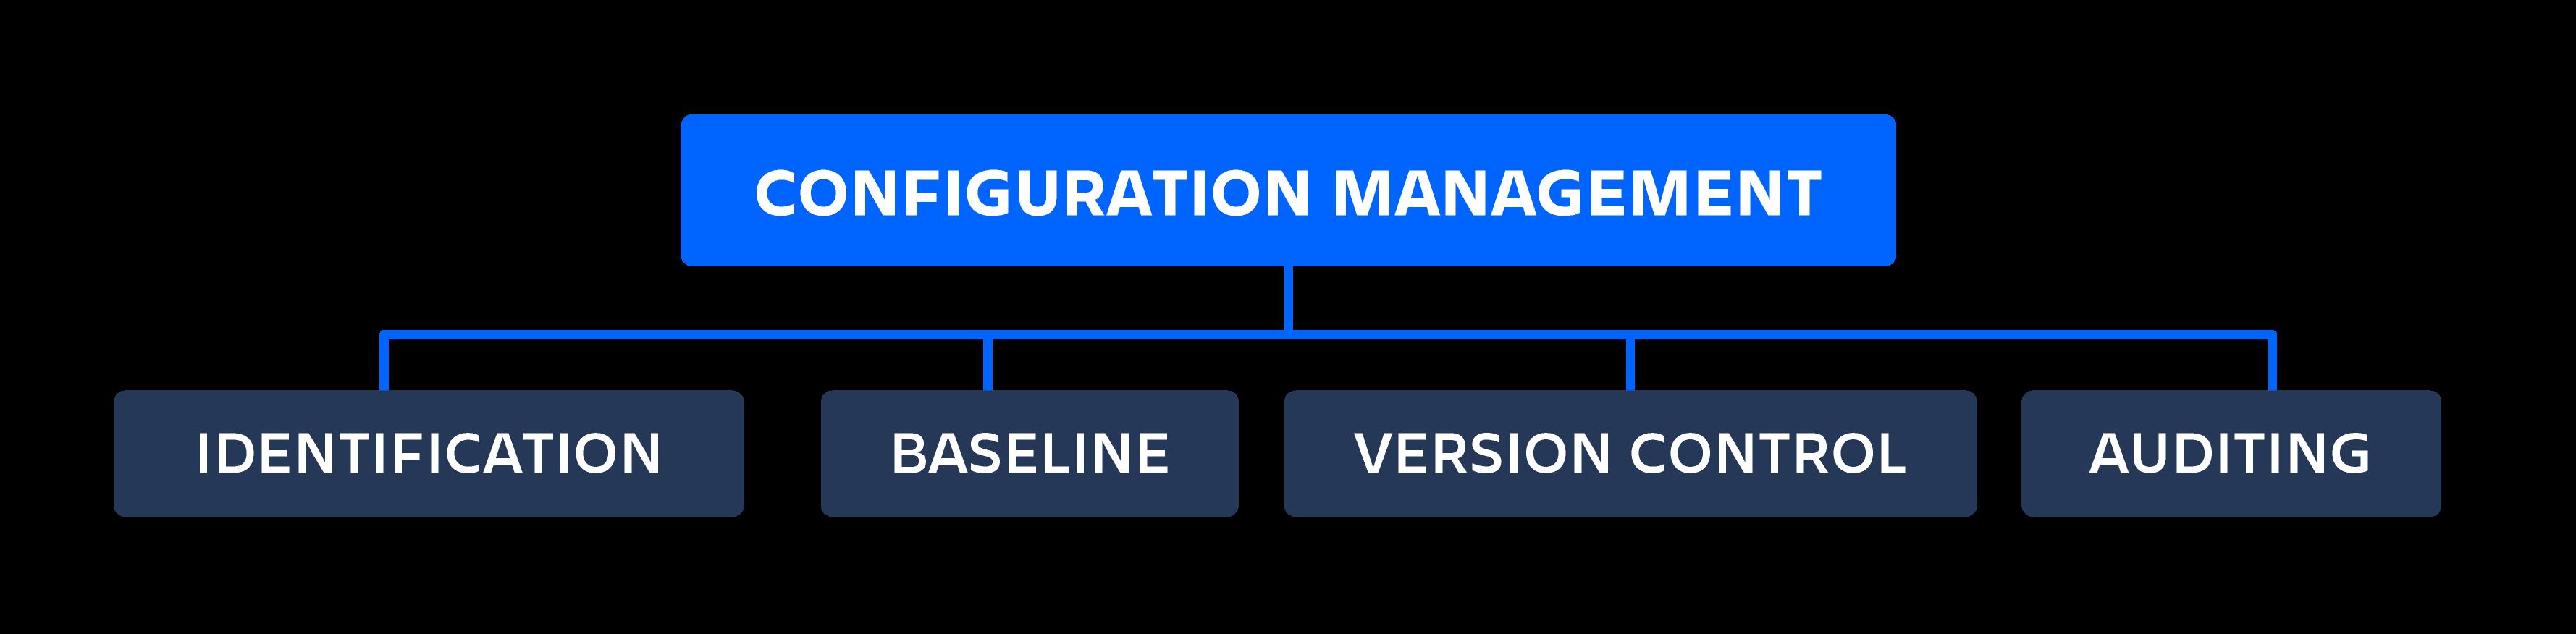 Diagramm: Konfigurationsmanagement